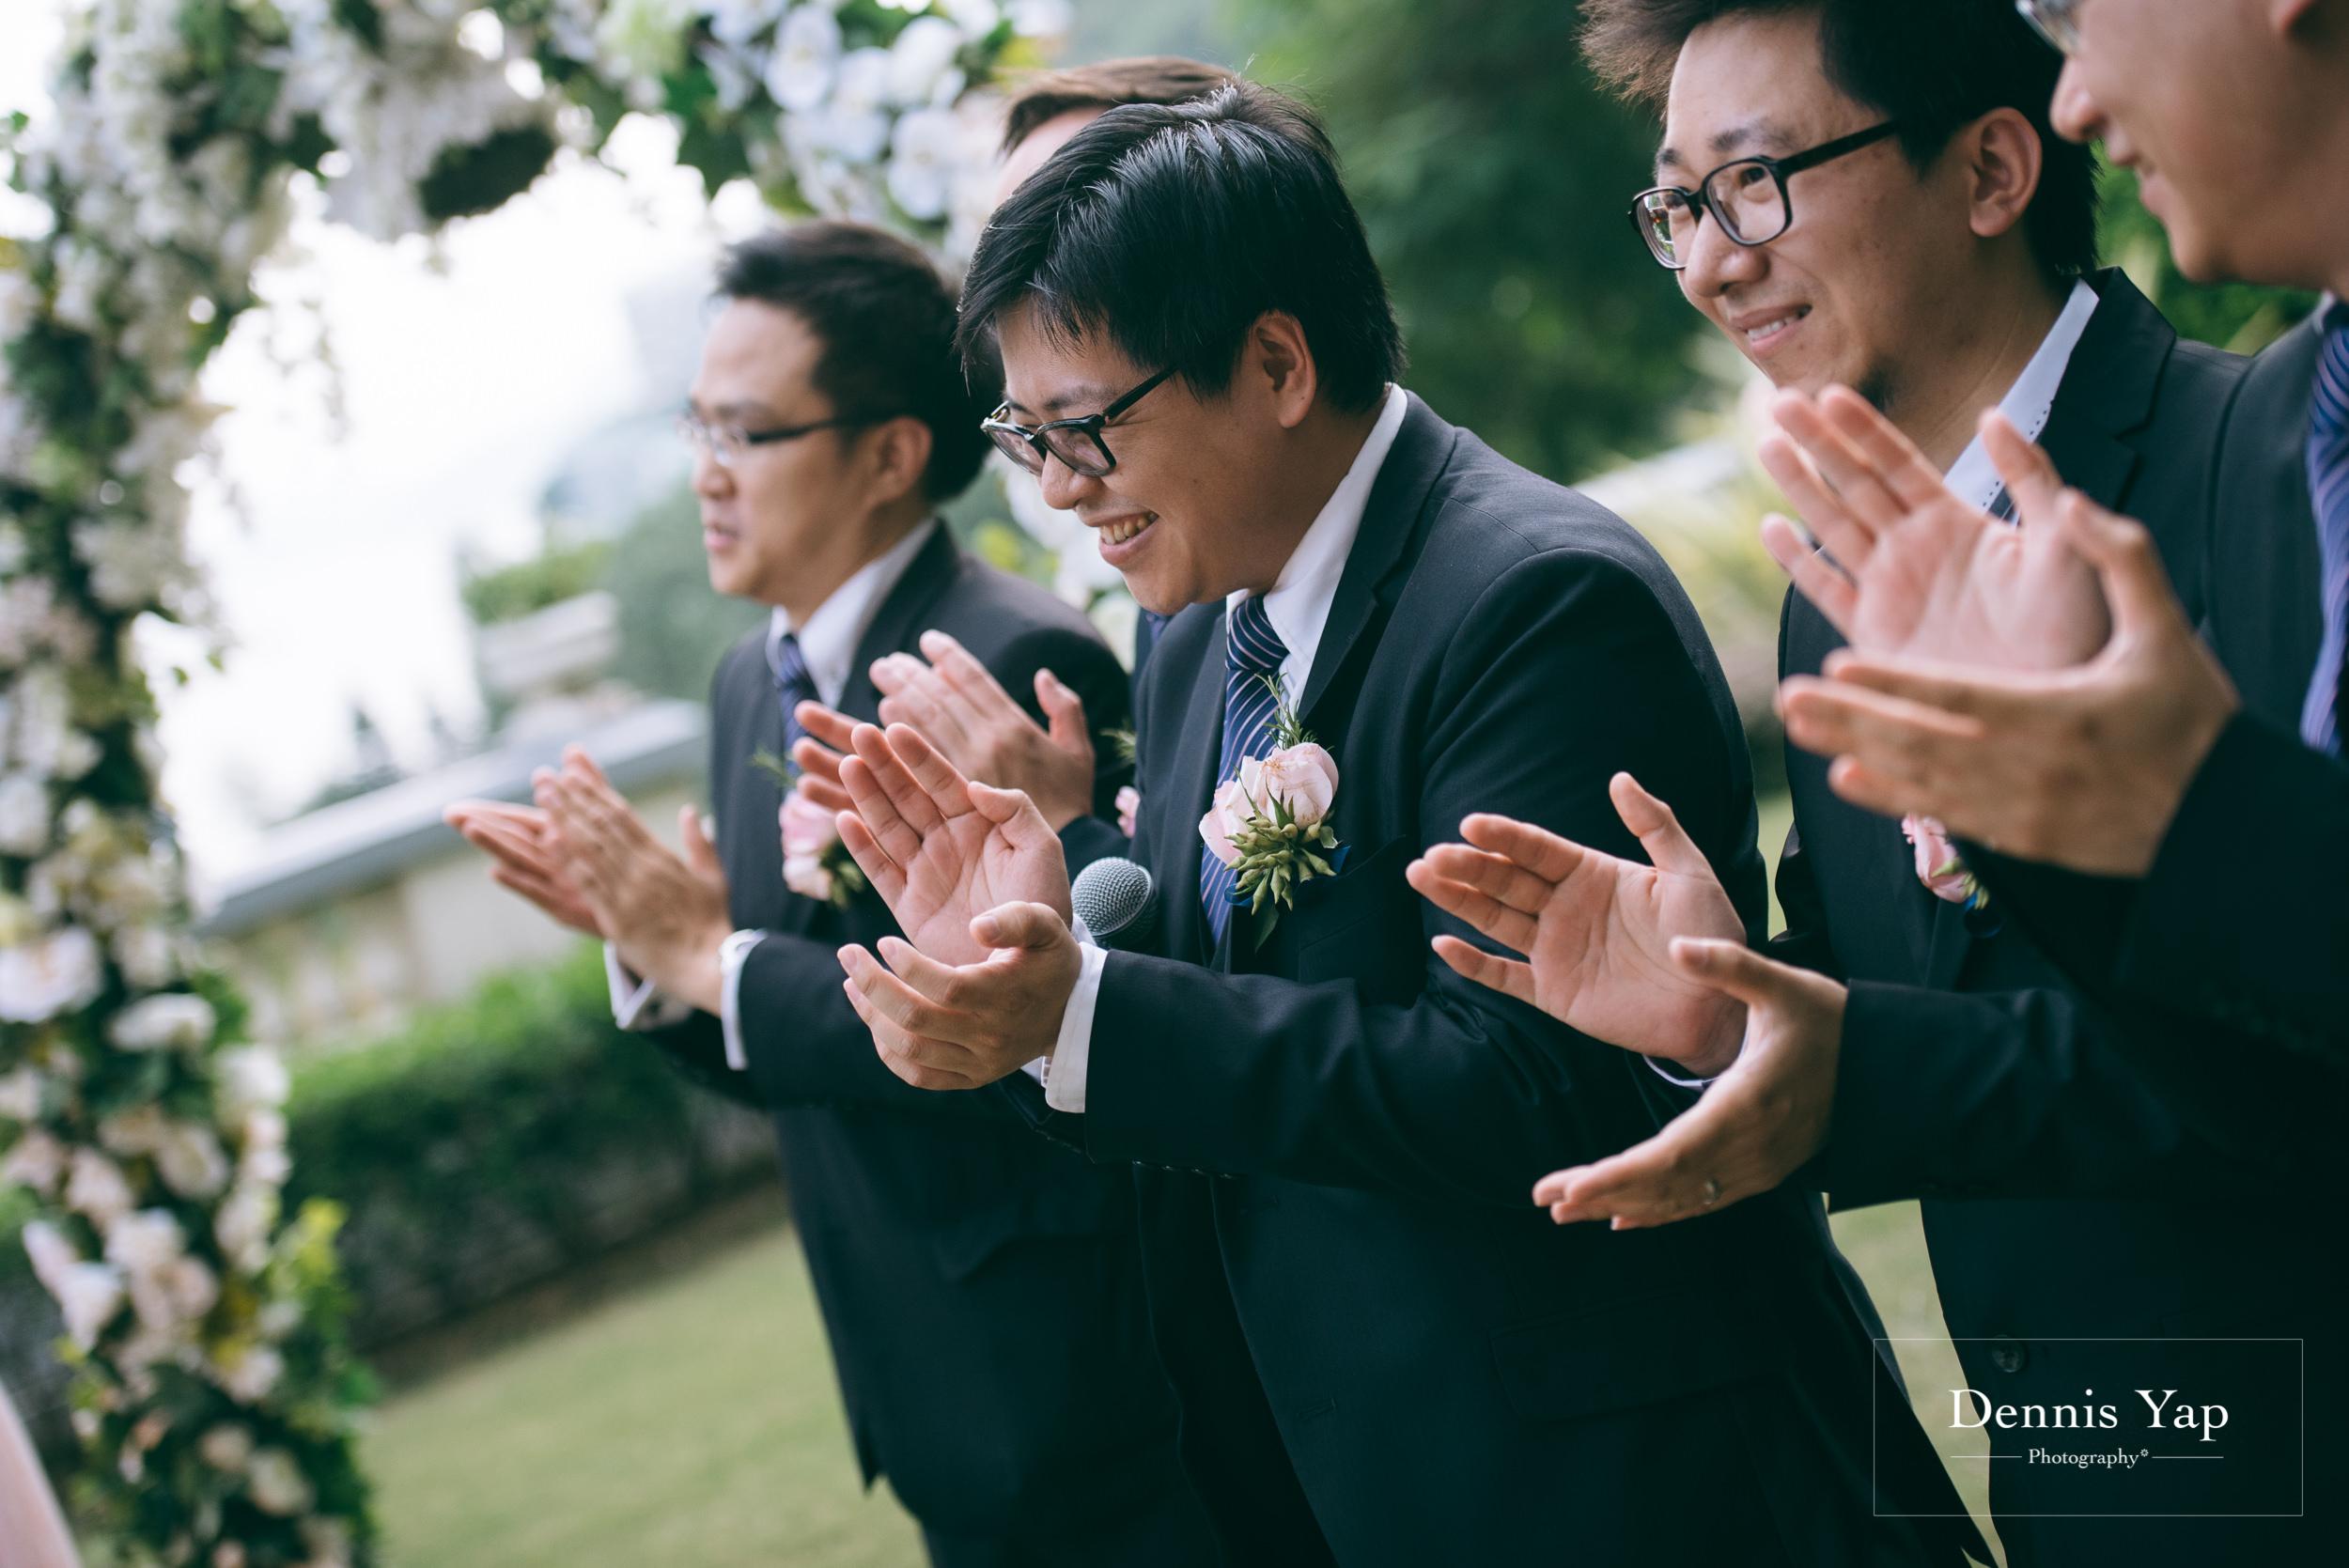 jason crystal wedding day gate crash hong kong garden wedding dennis yap photography-27.jpg